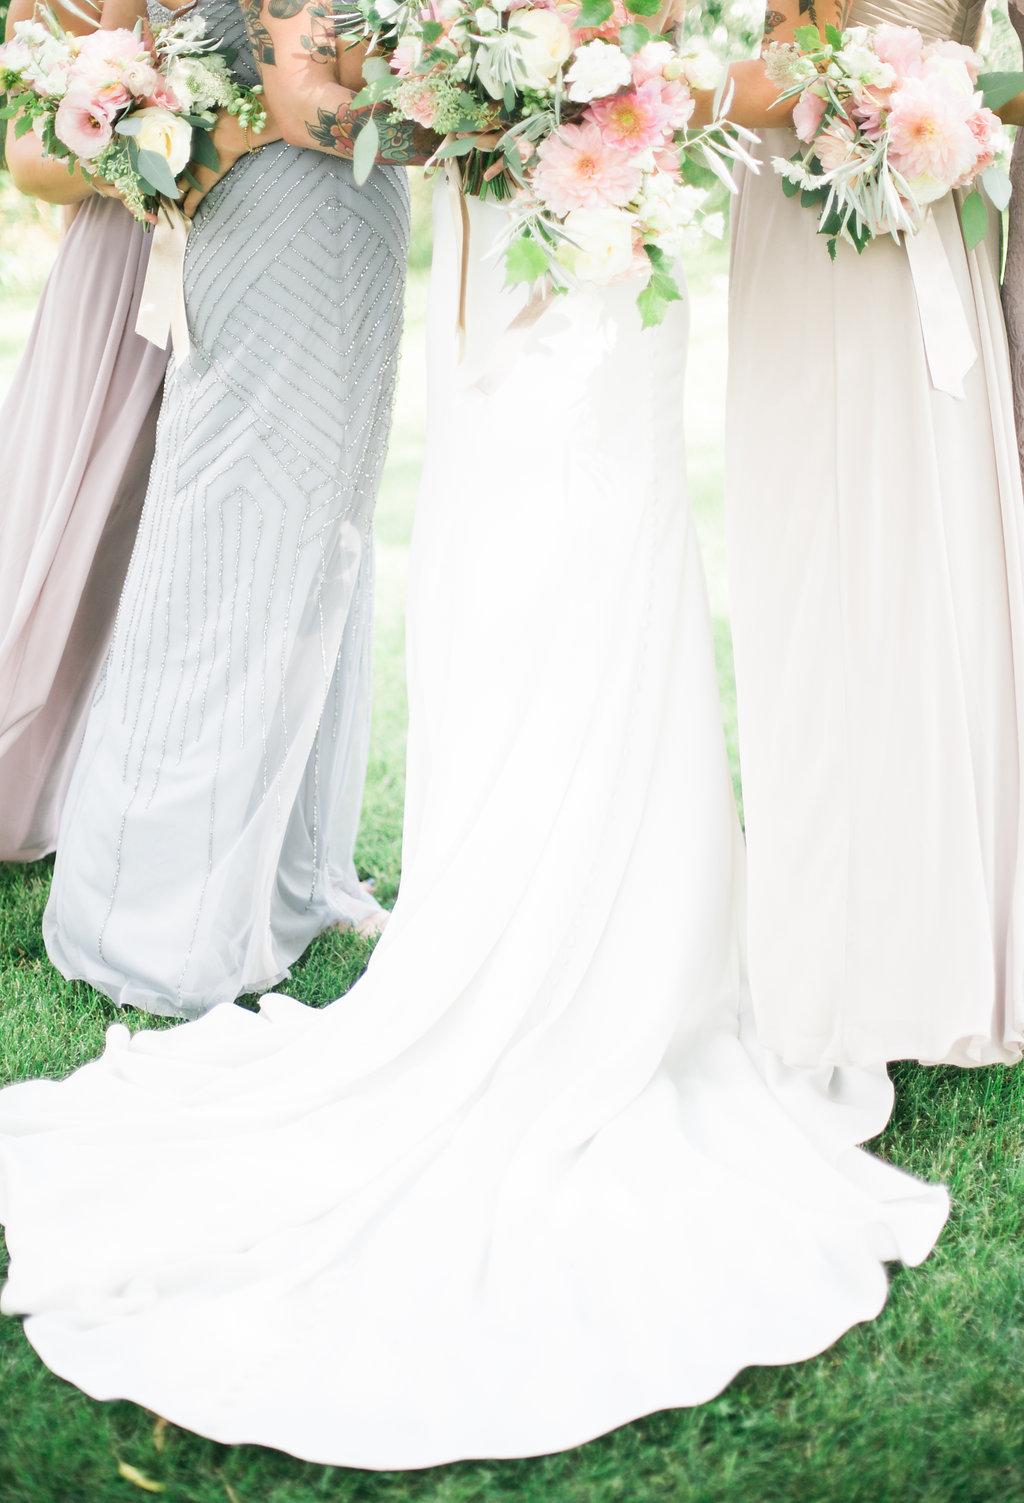 Garden Wedding Inspiration - Wedding Florist in Winnipeg